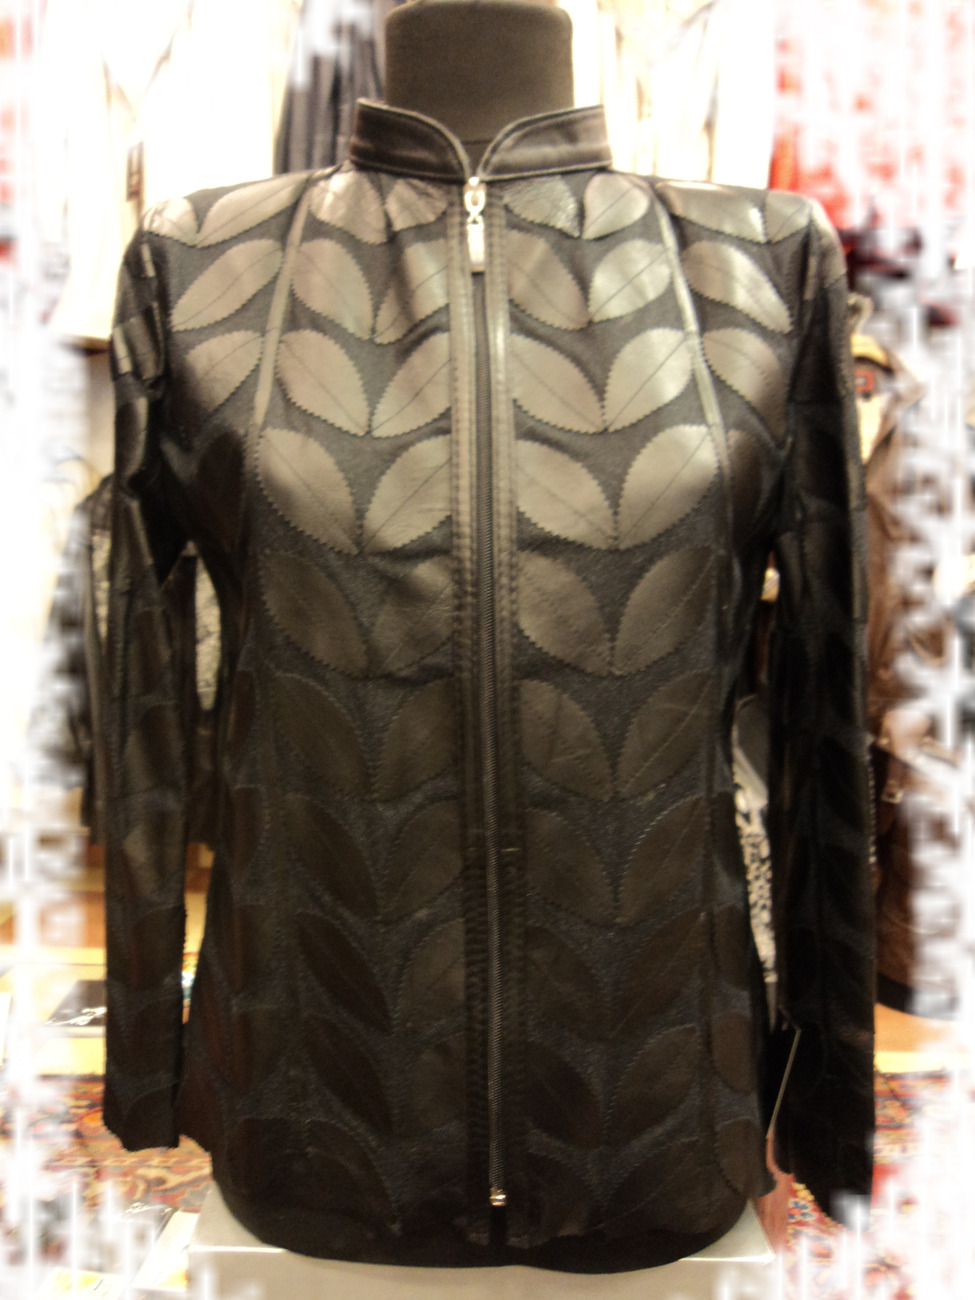 Womens Black Leather Leaf Jacket : All Regular Sizes Handmade Real Soft Lambskin